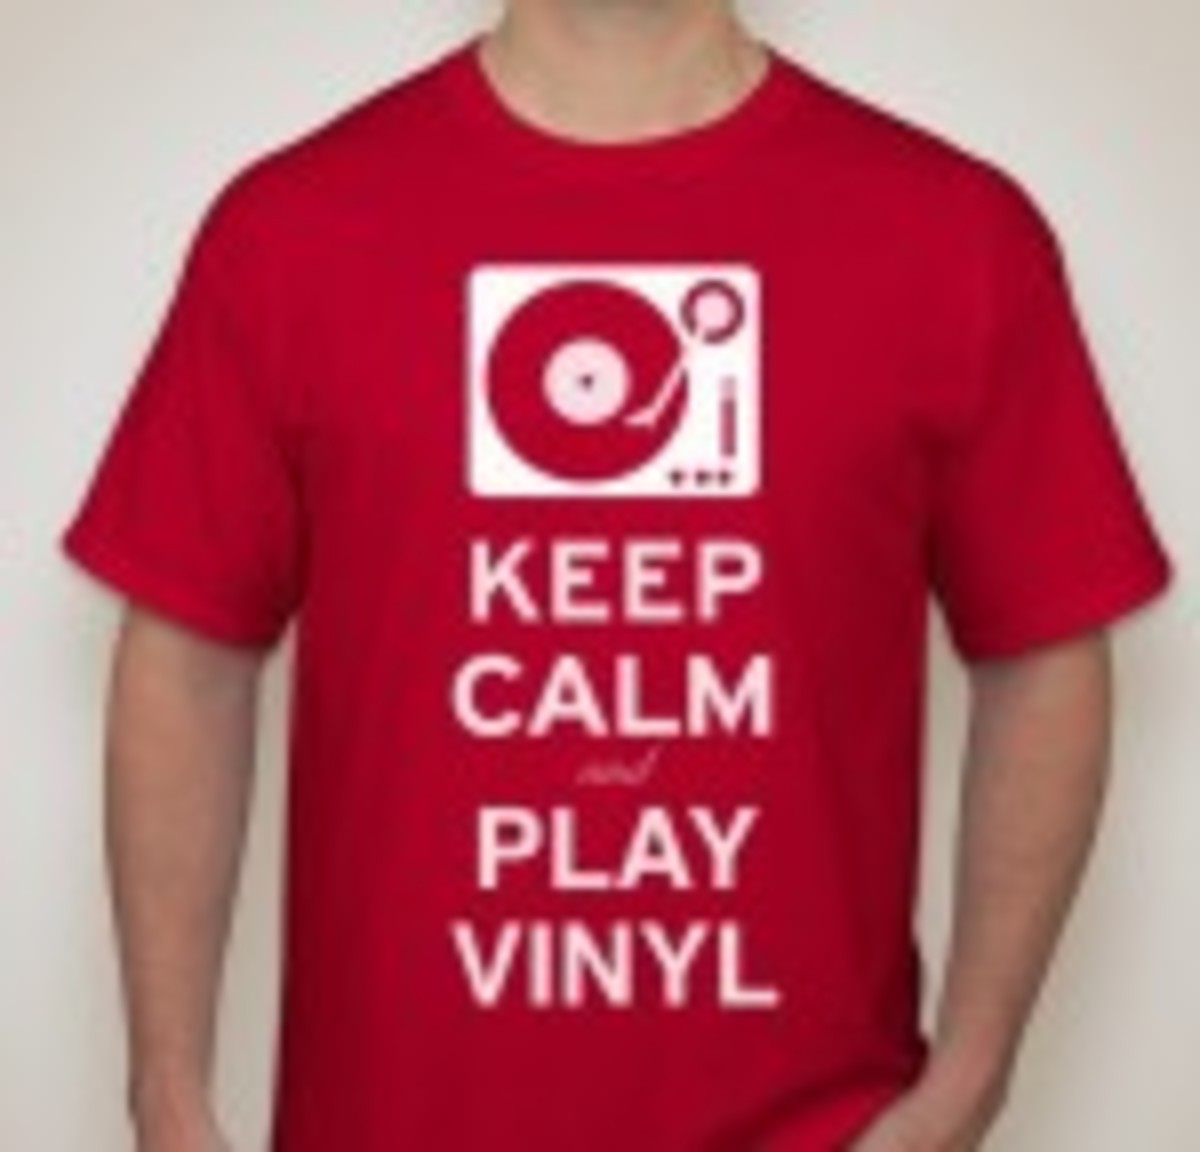 Keep Calm and Play Vinyl T-shirt Goldmine